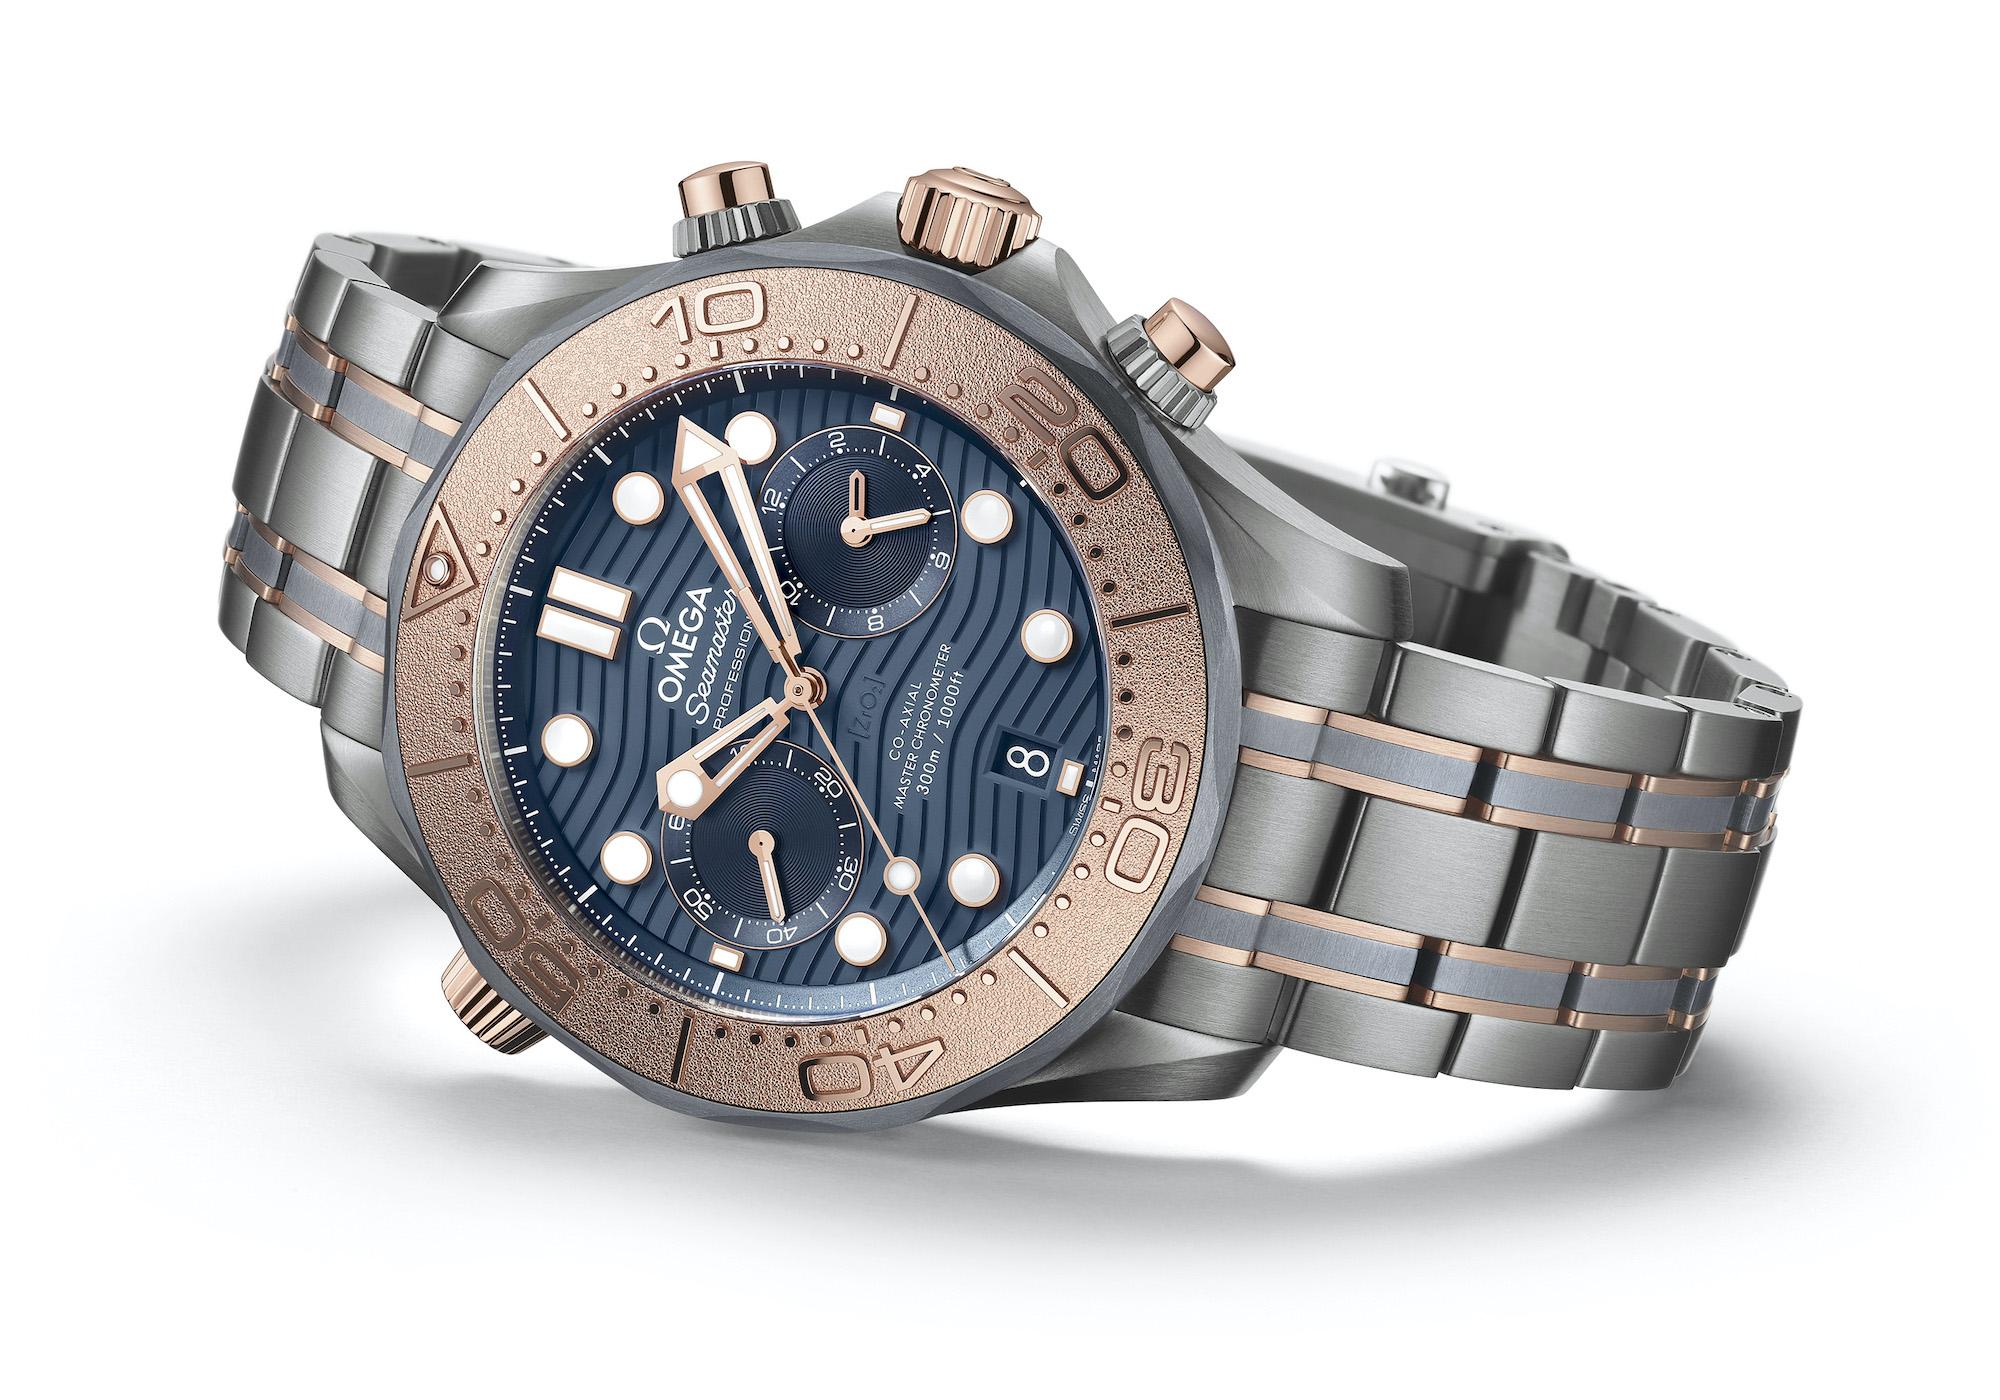 Omega Seamaster Diver 300M Chronograph oro titanio tantalio 210.60.44.51.03.001